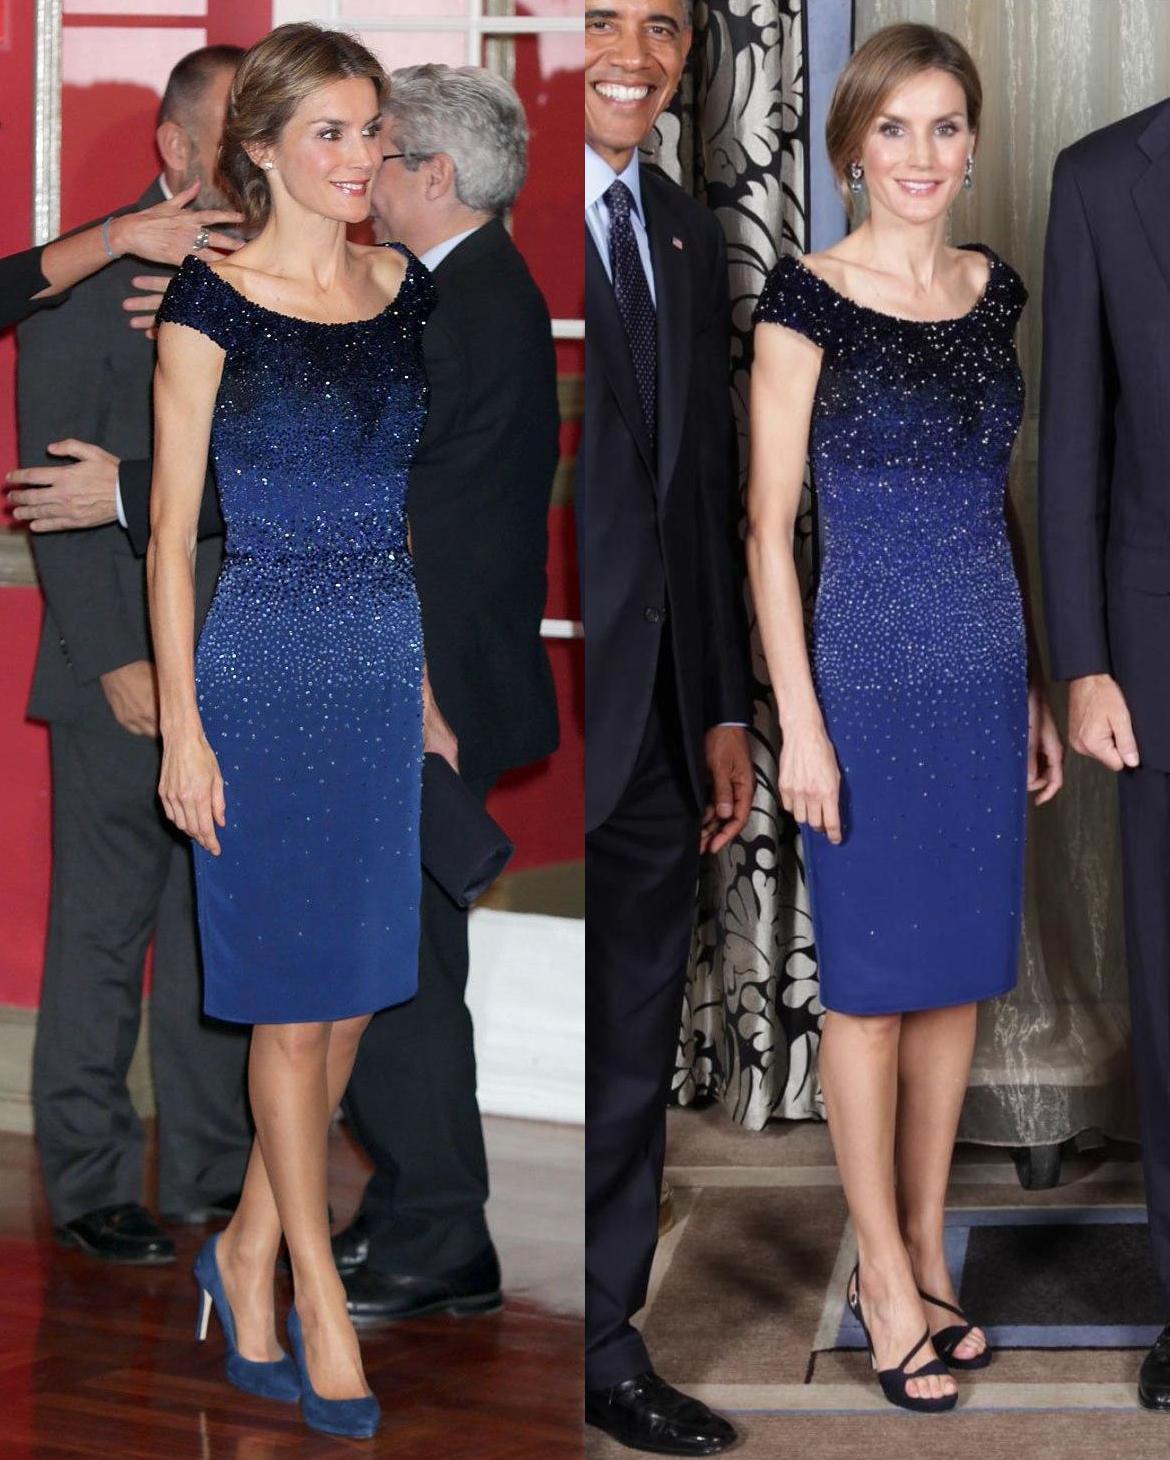 King Felipe & Queen Letizia - Dresses